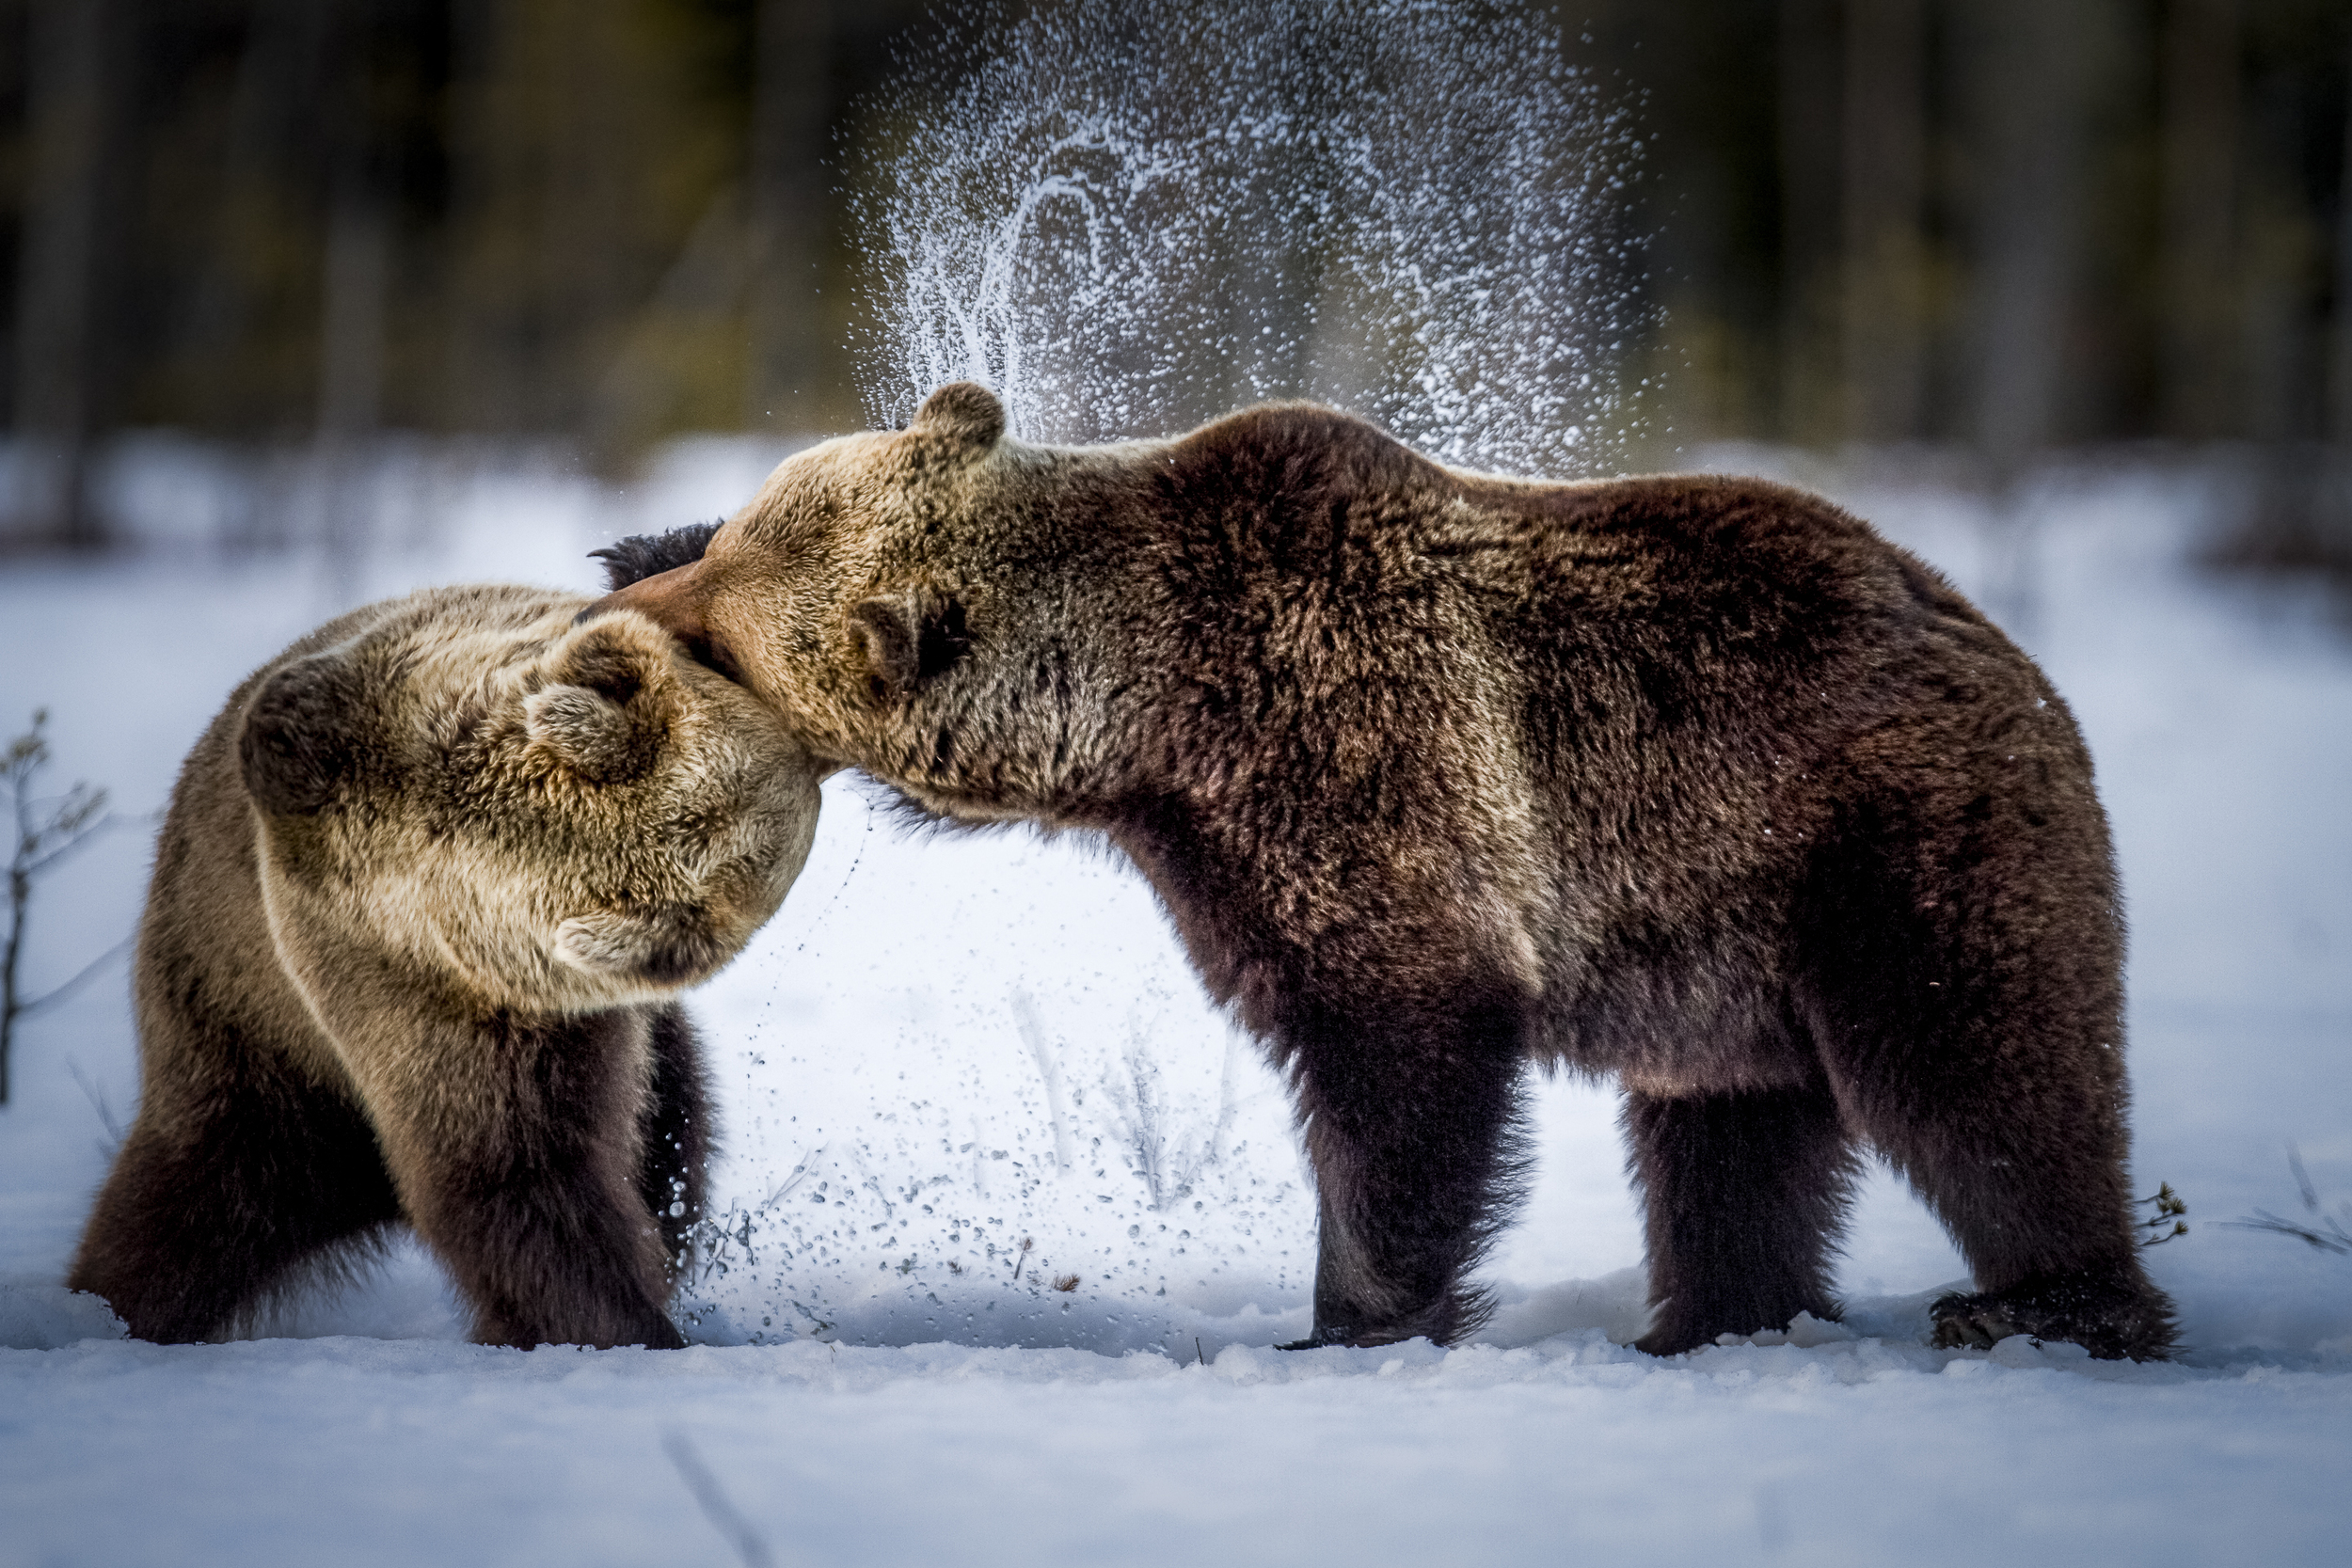 stephaneleroy_wild_finland_05.jpg